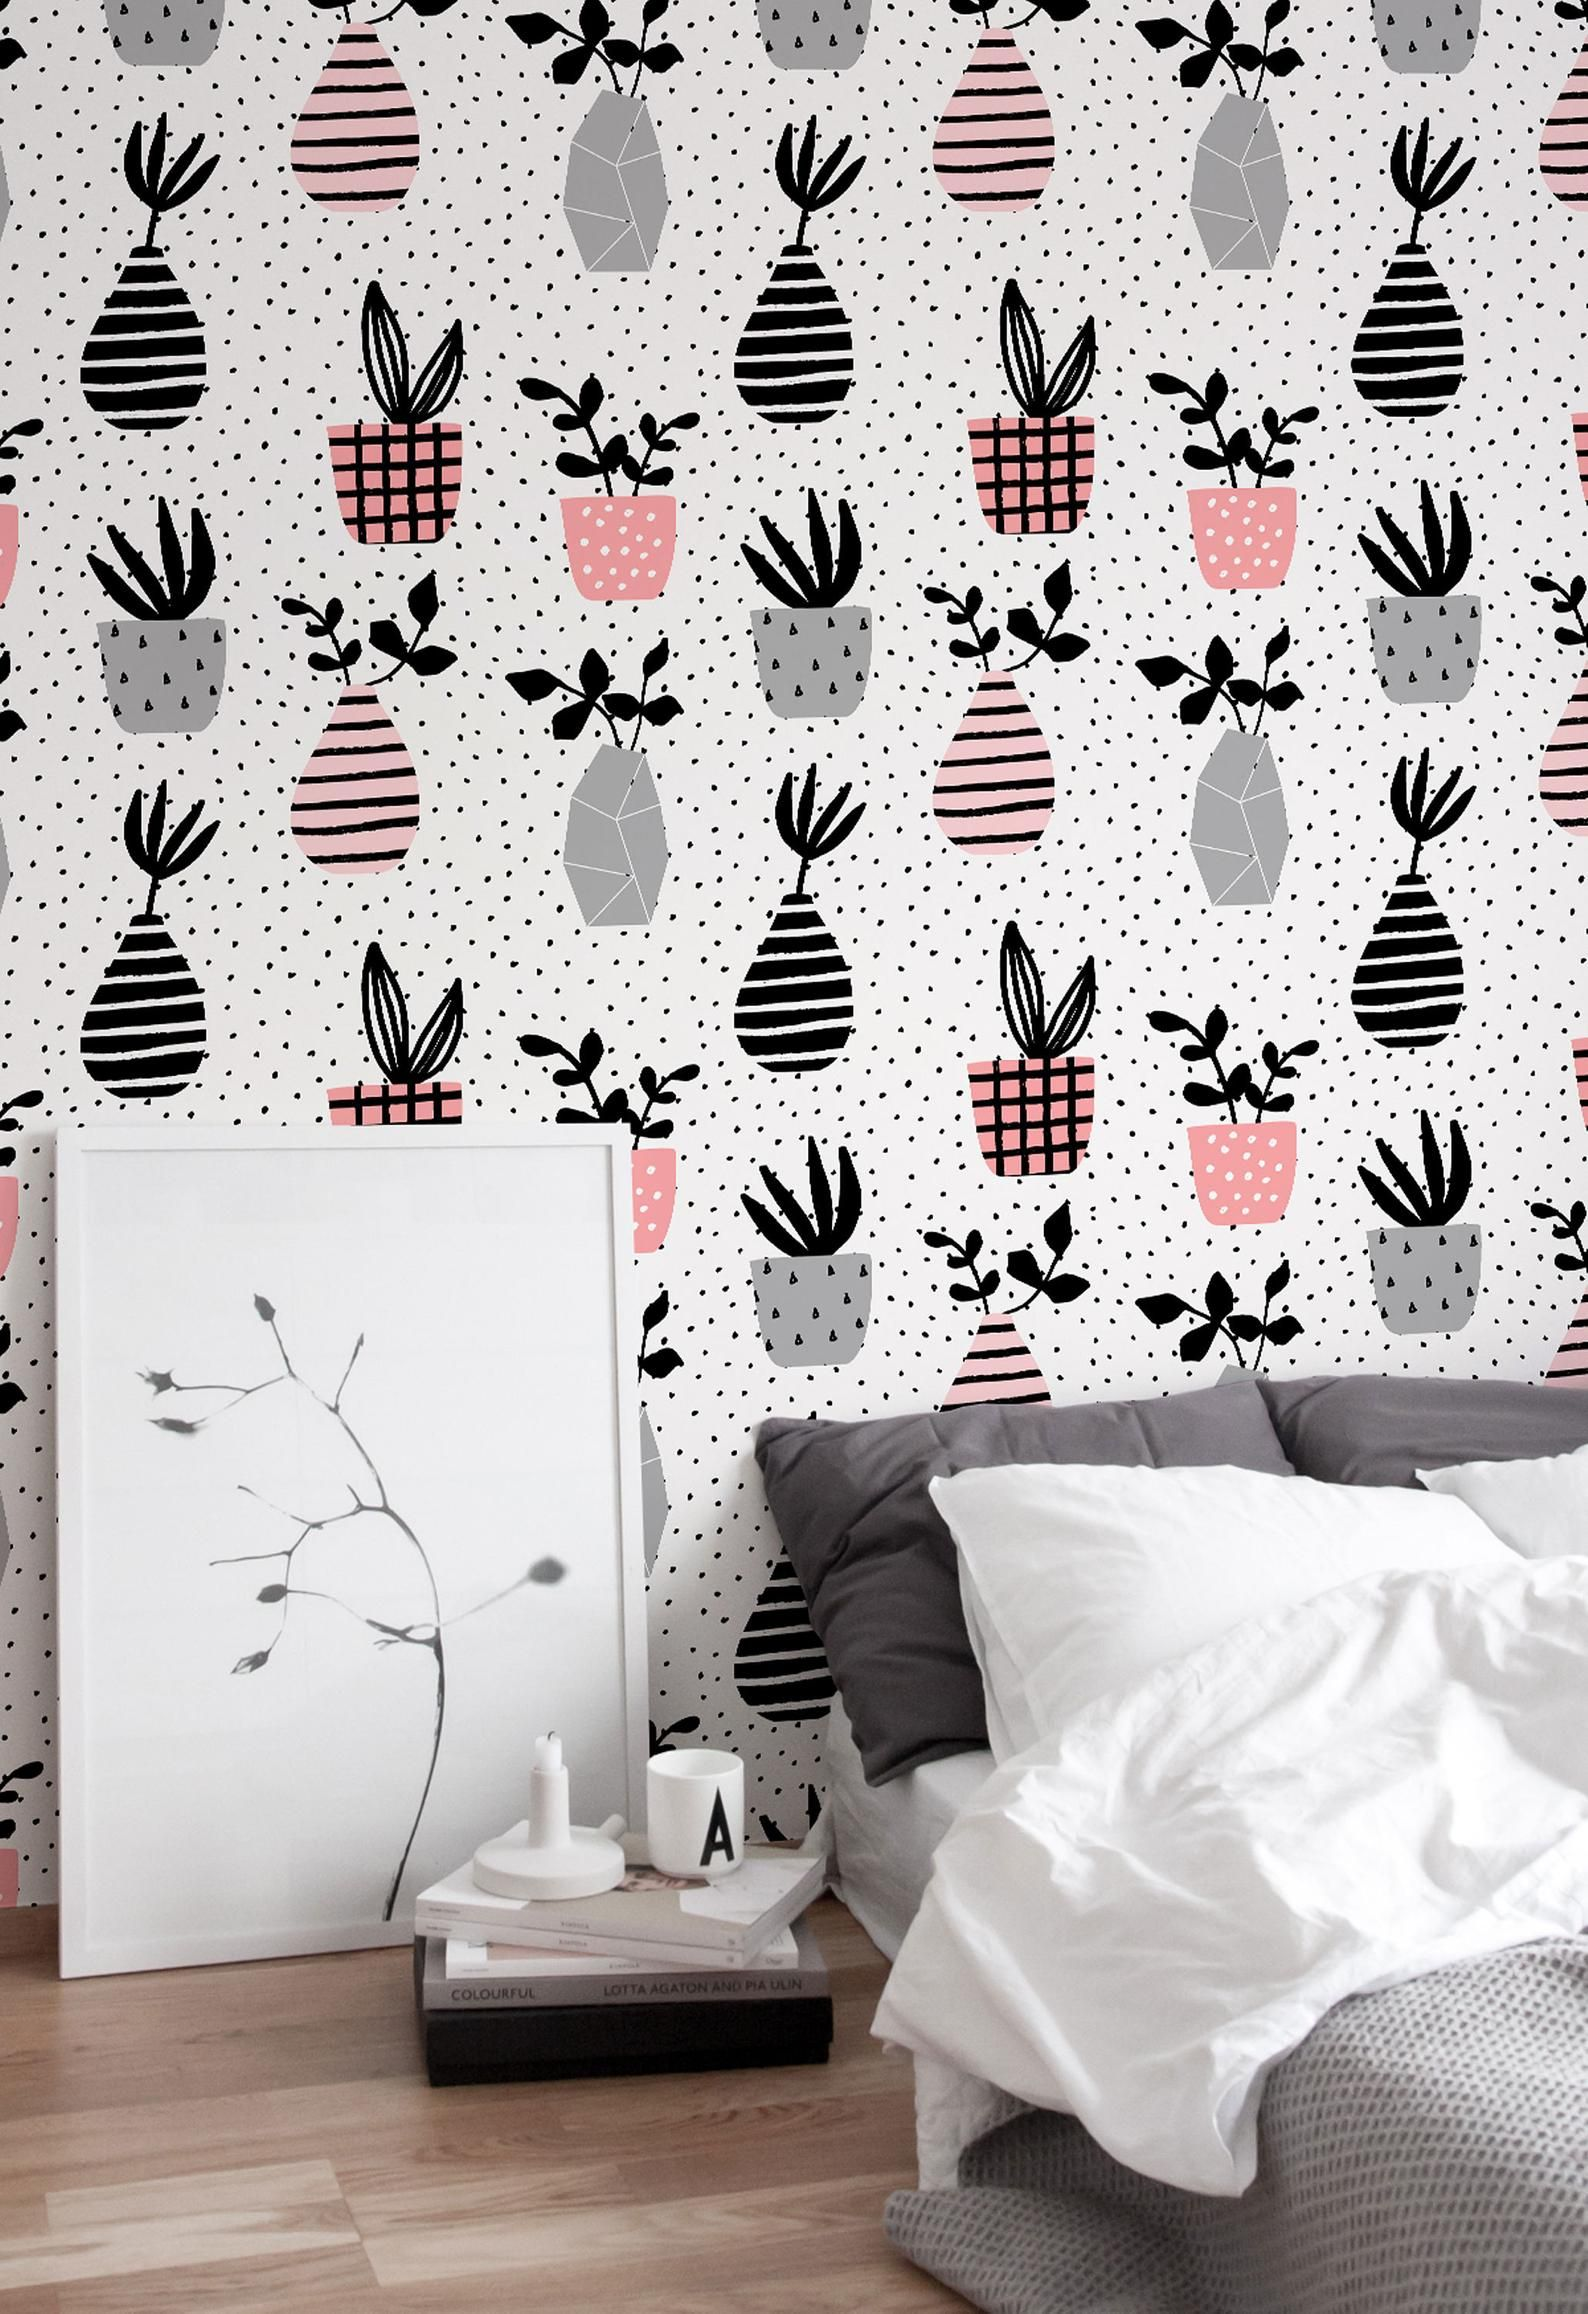 Cactus Wallpaper / Flower Wallpaper / Removable Wallpaper